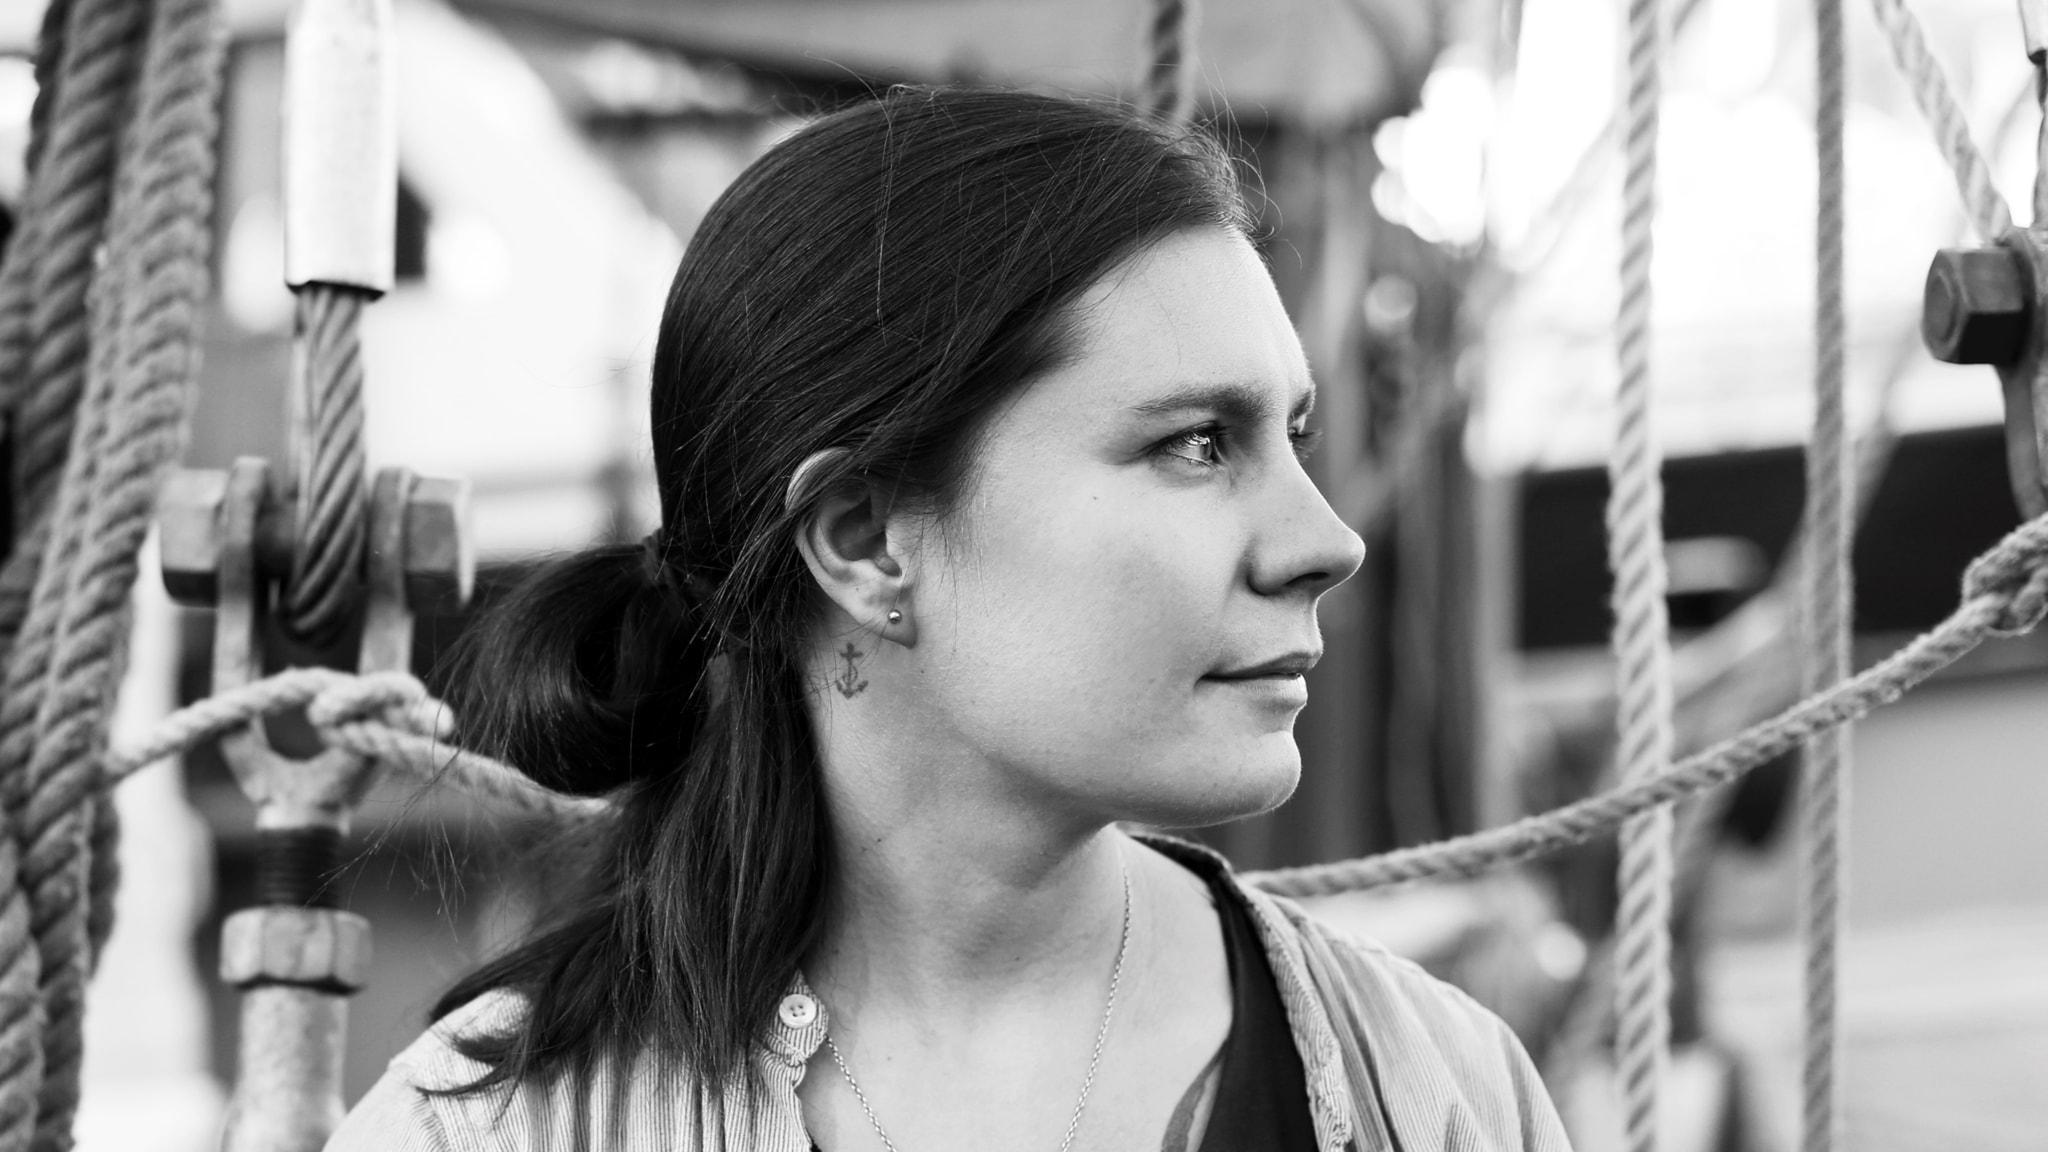 Karin Gafvelin - Jag brukade ringa henne från havet